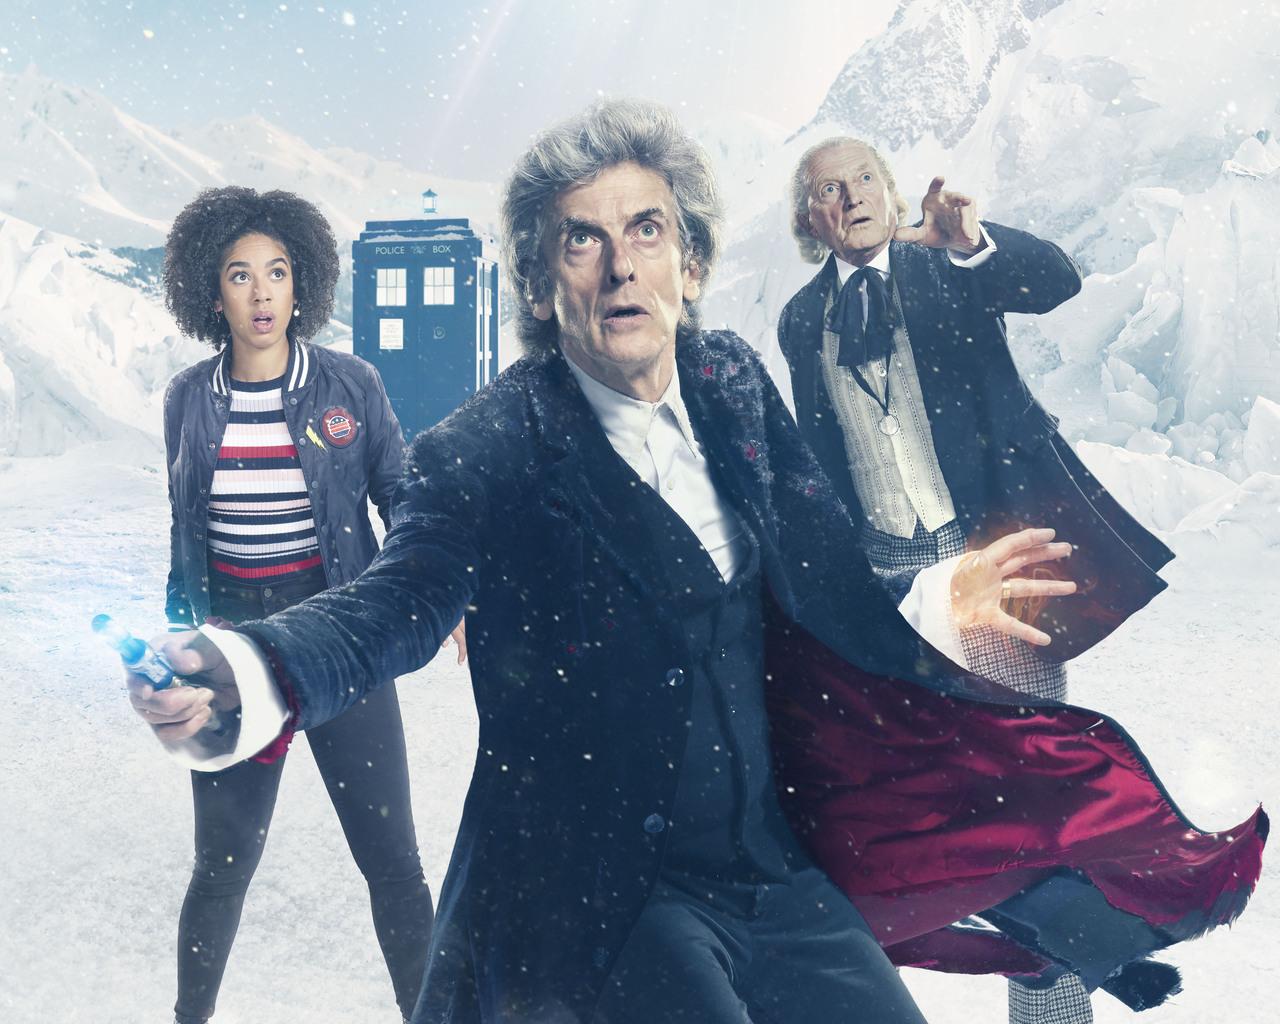 1280x1024 Doctor Who Season 10 Christmas Special 5k 1280x1024